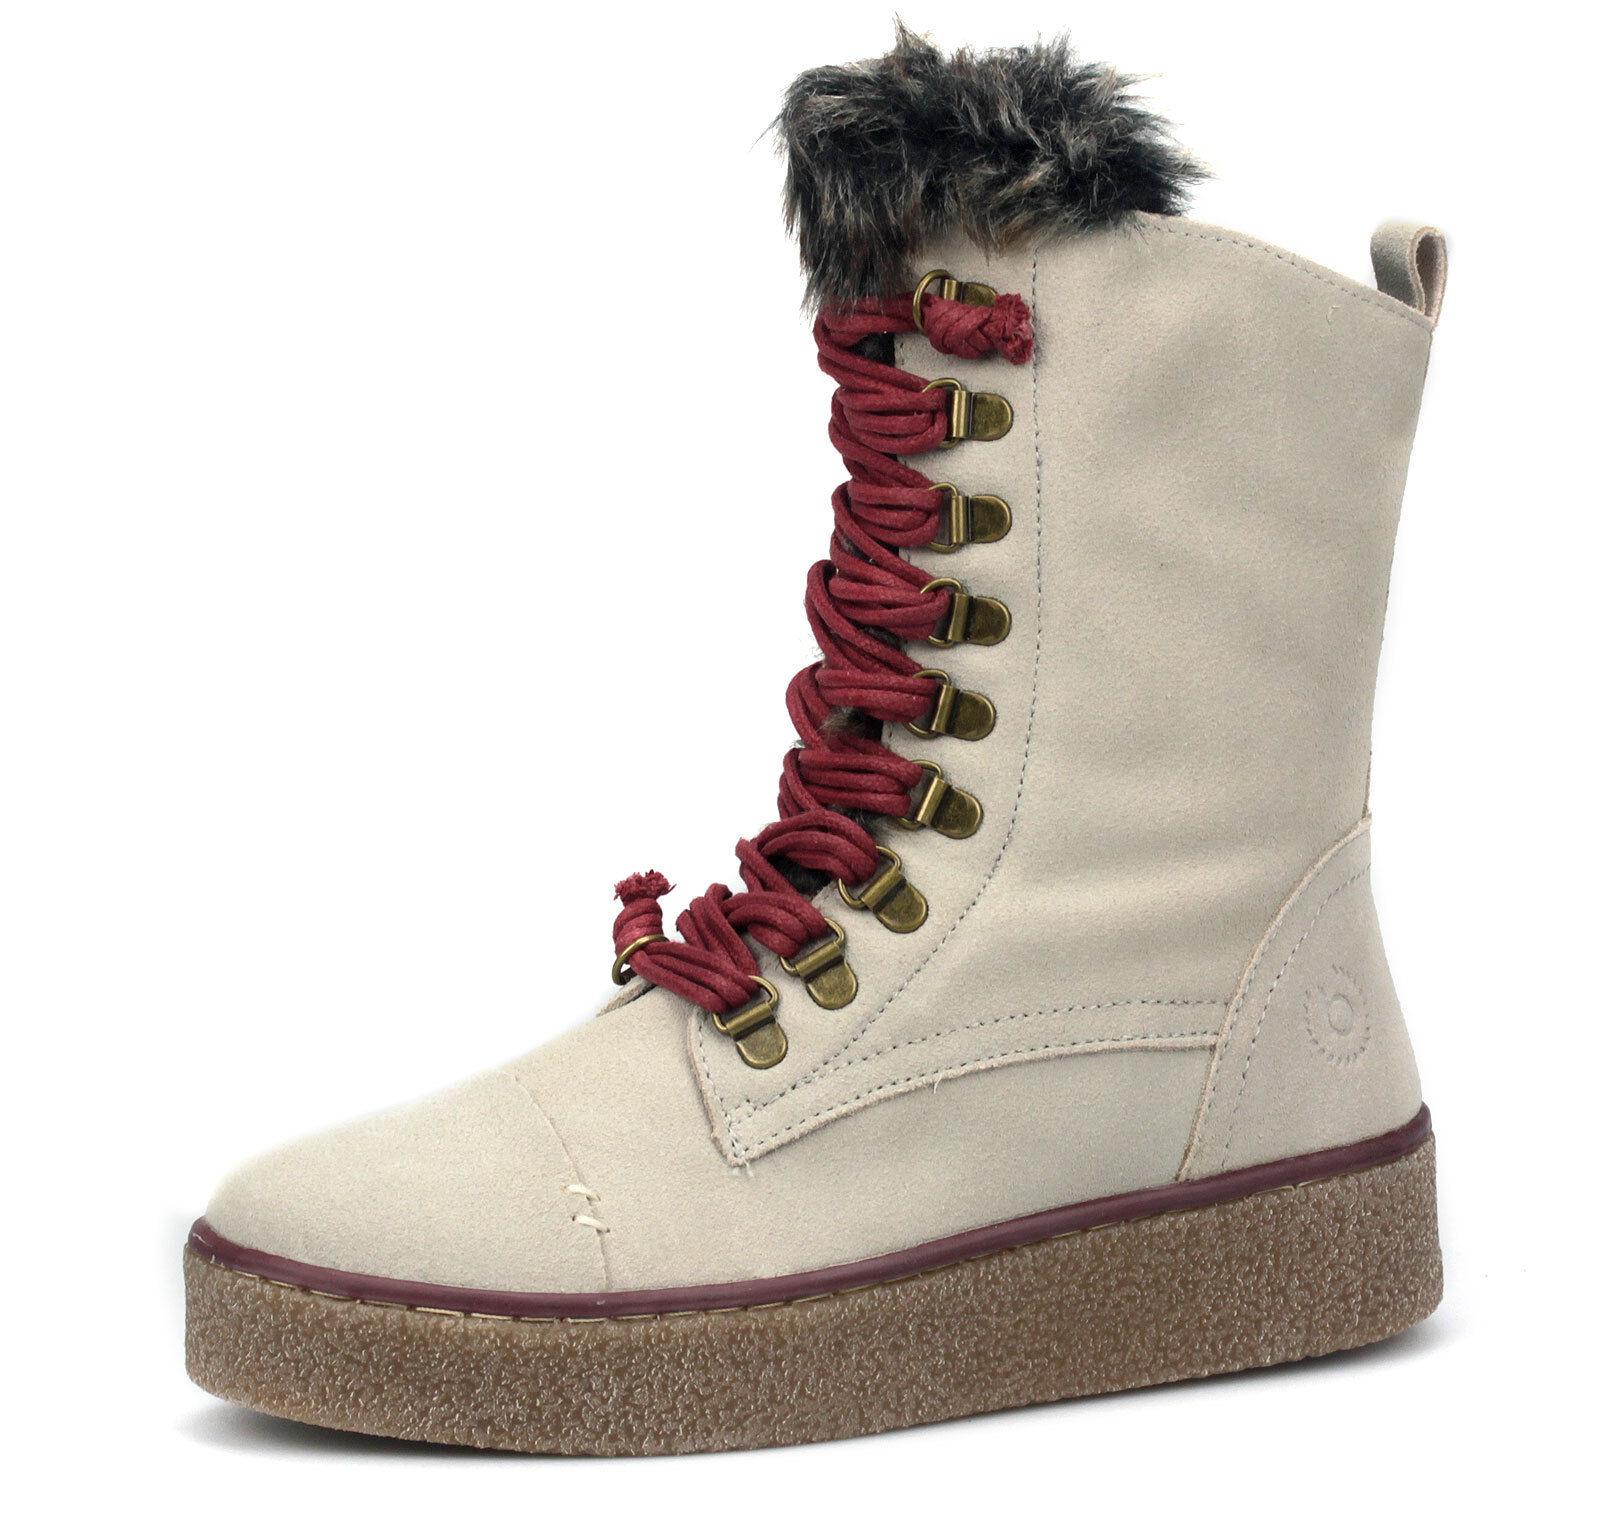 reputable site e1502 c7728 Men s Nike Internationalist Mid Casual Shoes 682844 003 Size 10 10 10 Photo  Blue 9c2877